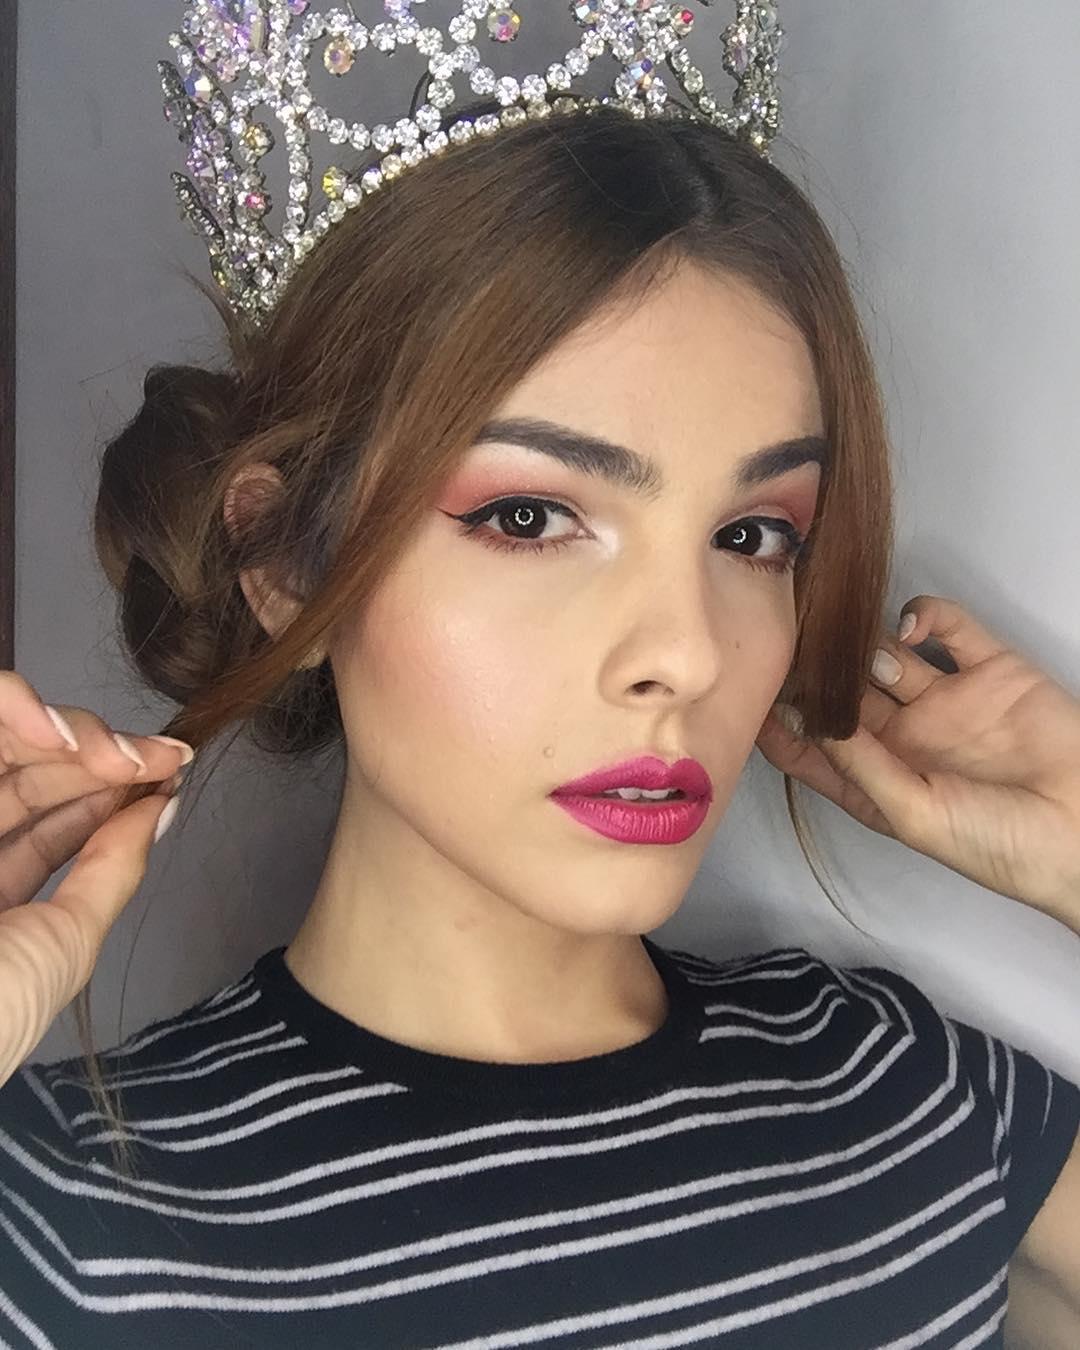 nathalie de oliveira, miss bom jardim 2019/1st runner-up de miss international queen 2016. - Página 2 39929210